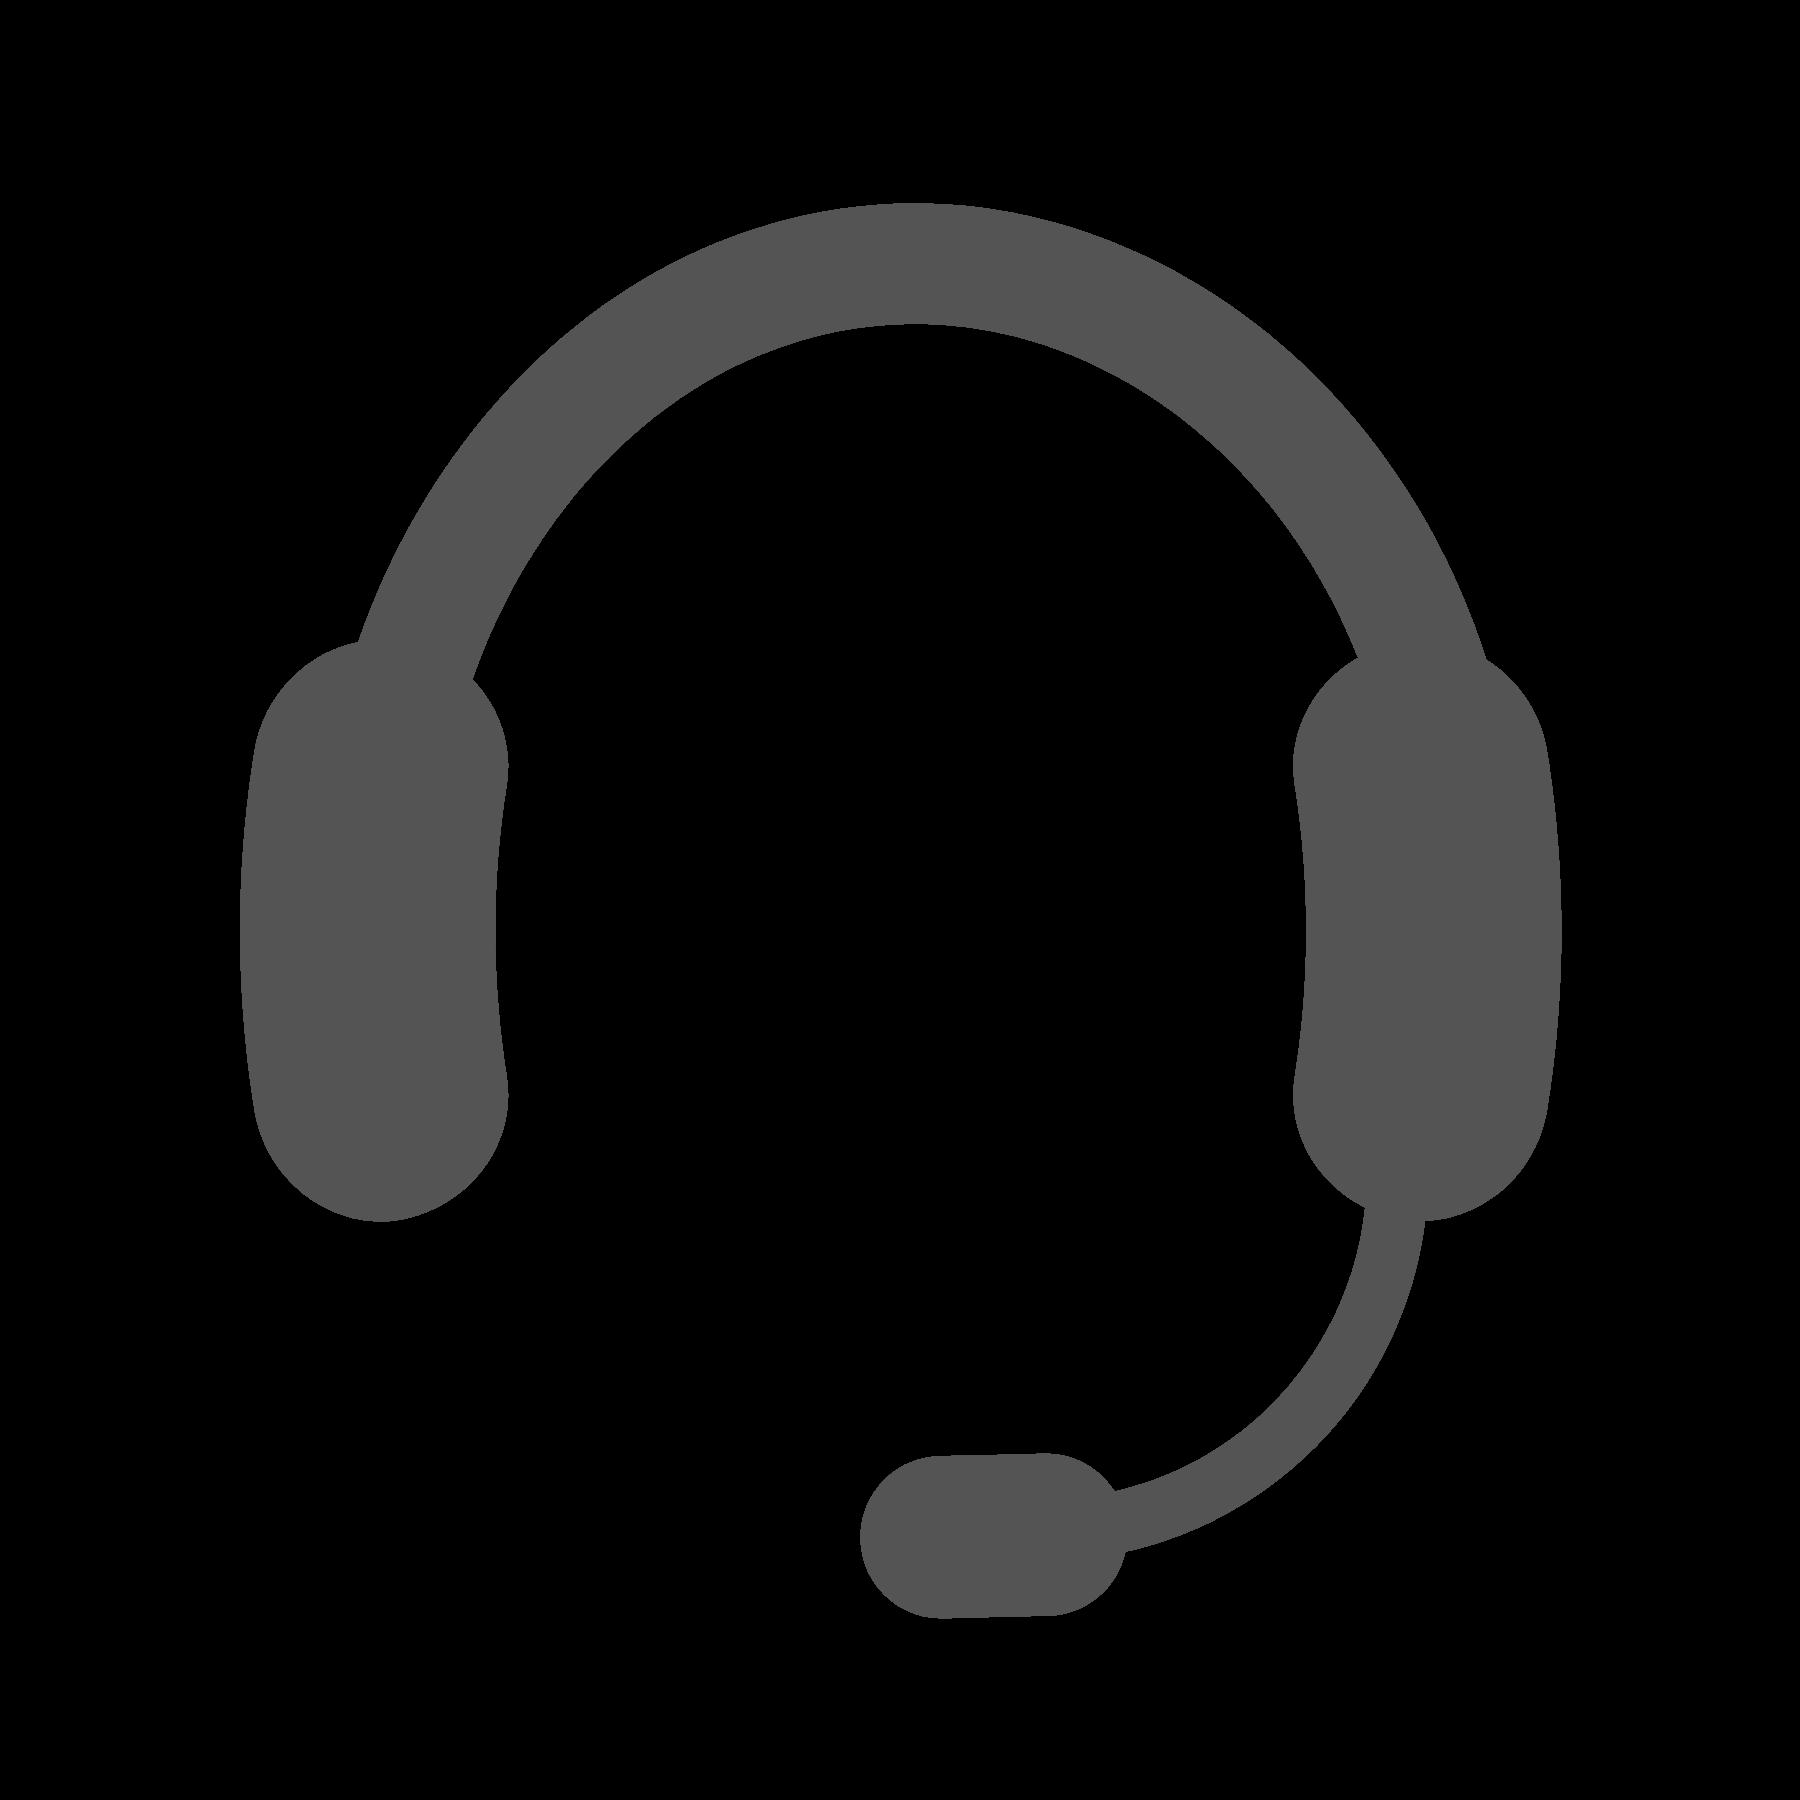 Call center graphic